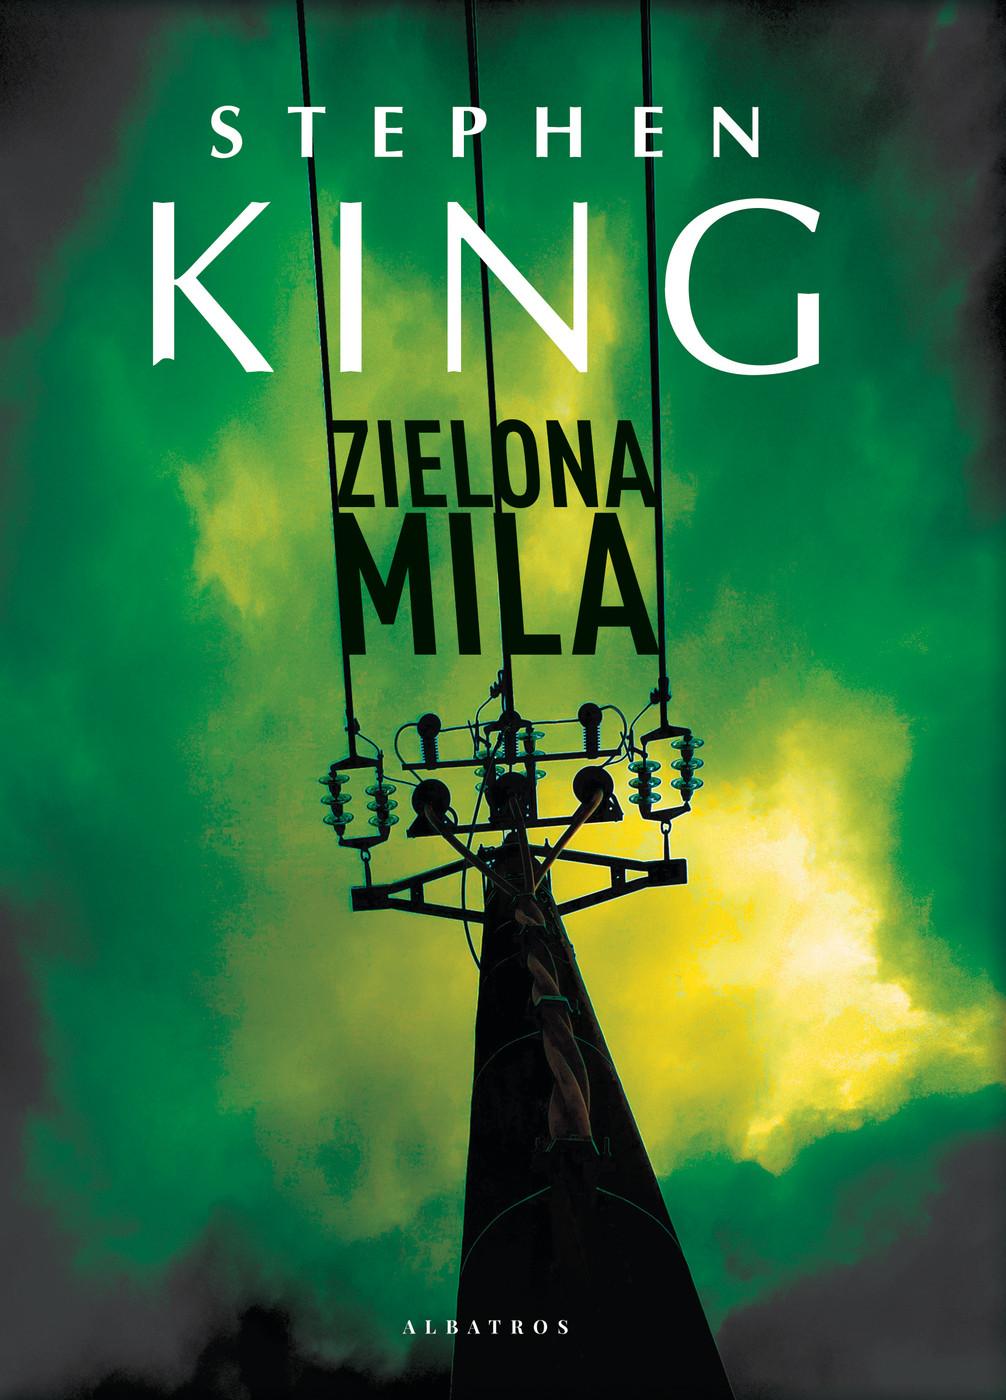 Zielona Mila,Stephen King